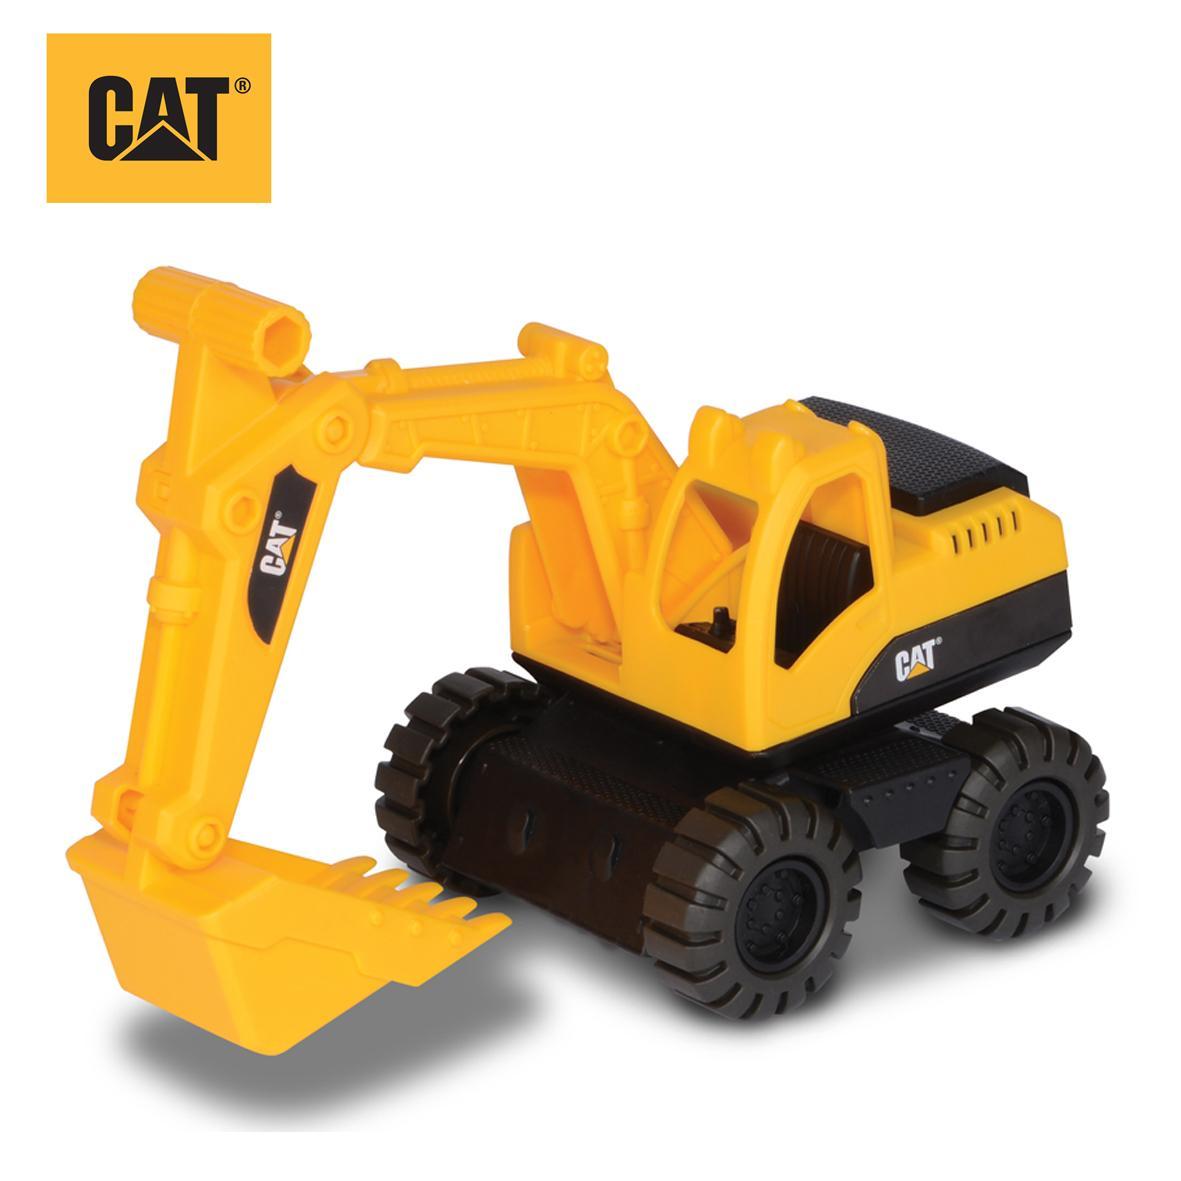 Cat Construction Toys : Cat construction crew excavator vehicle playset amazon